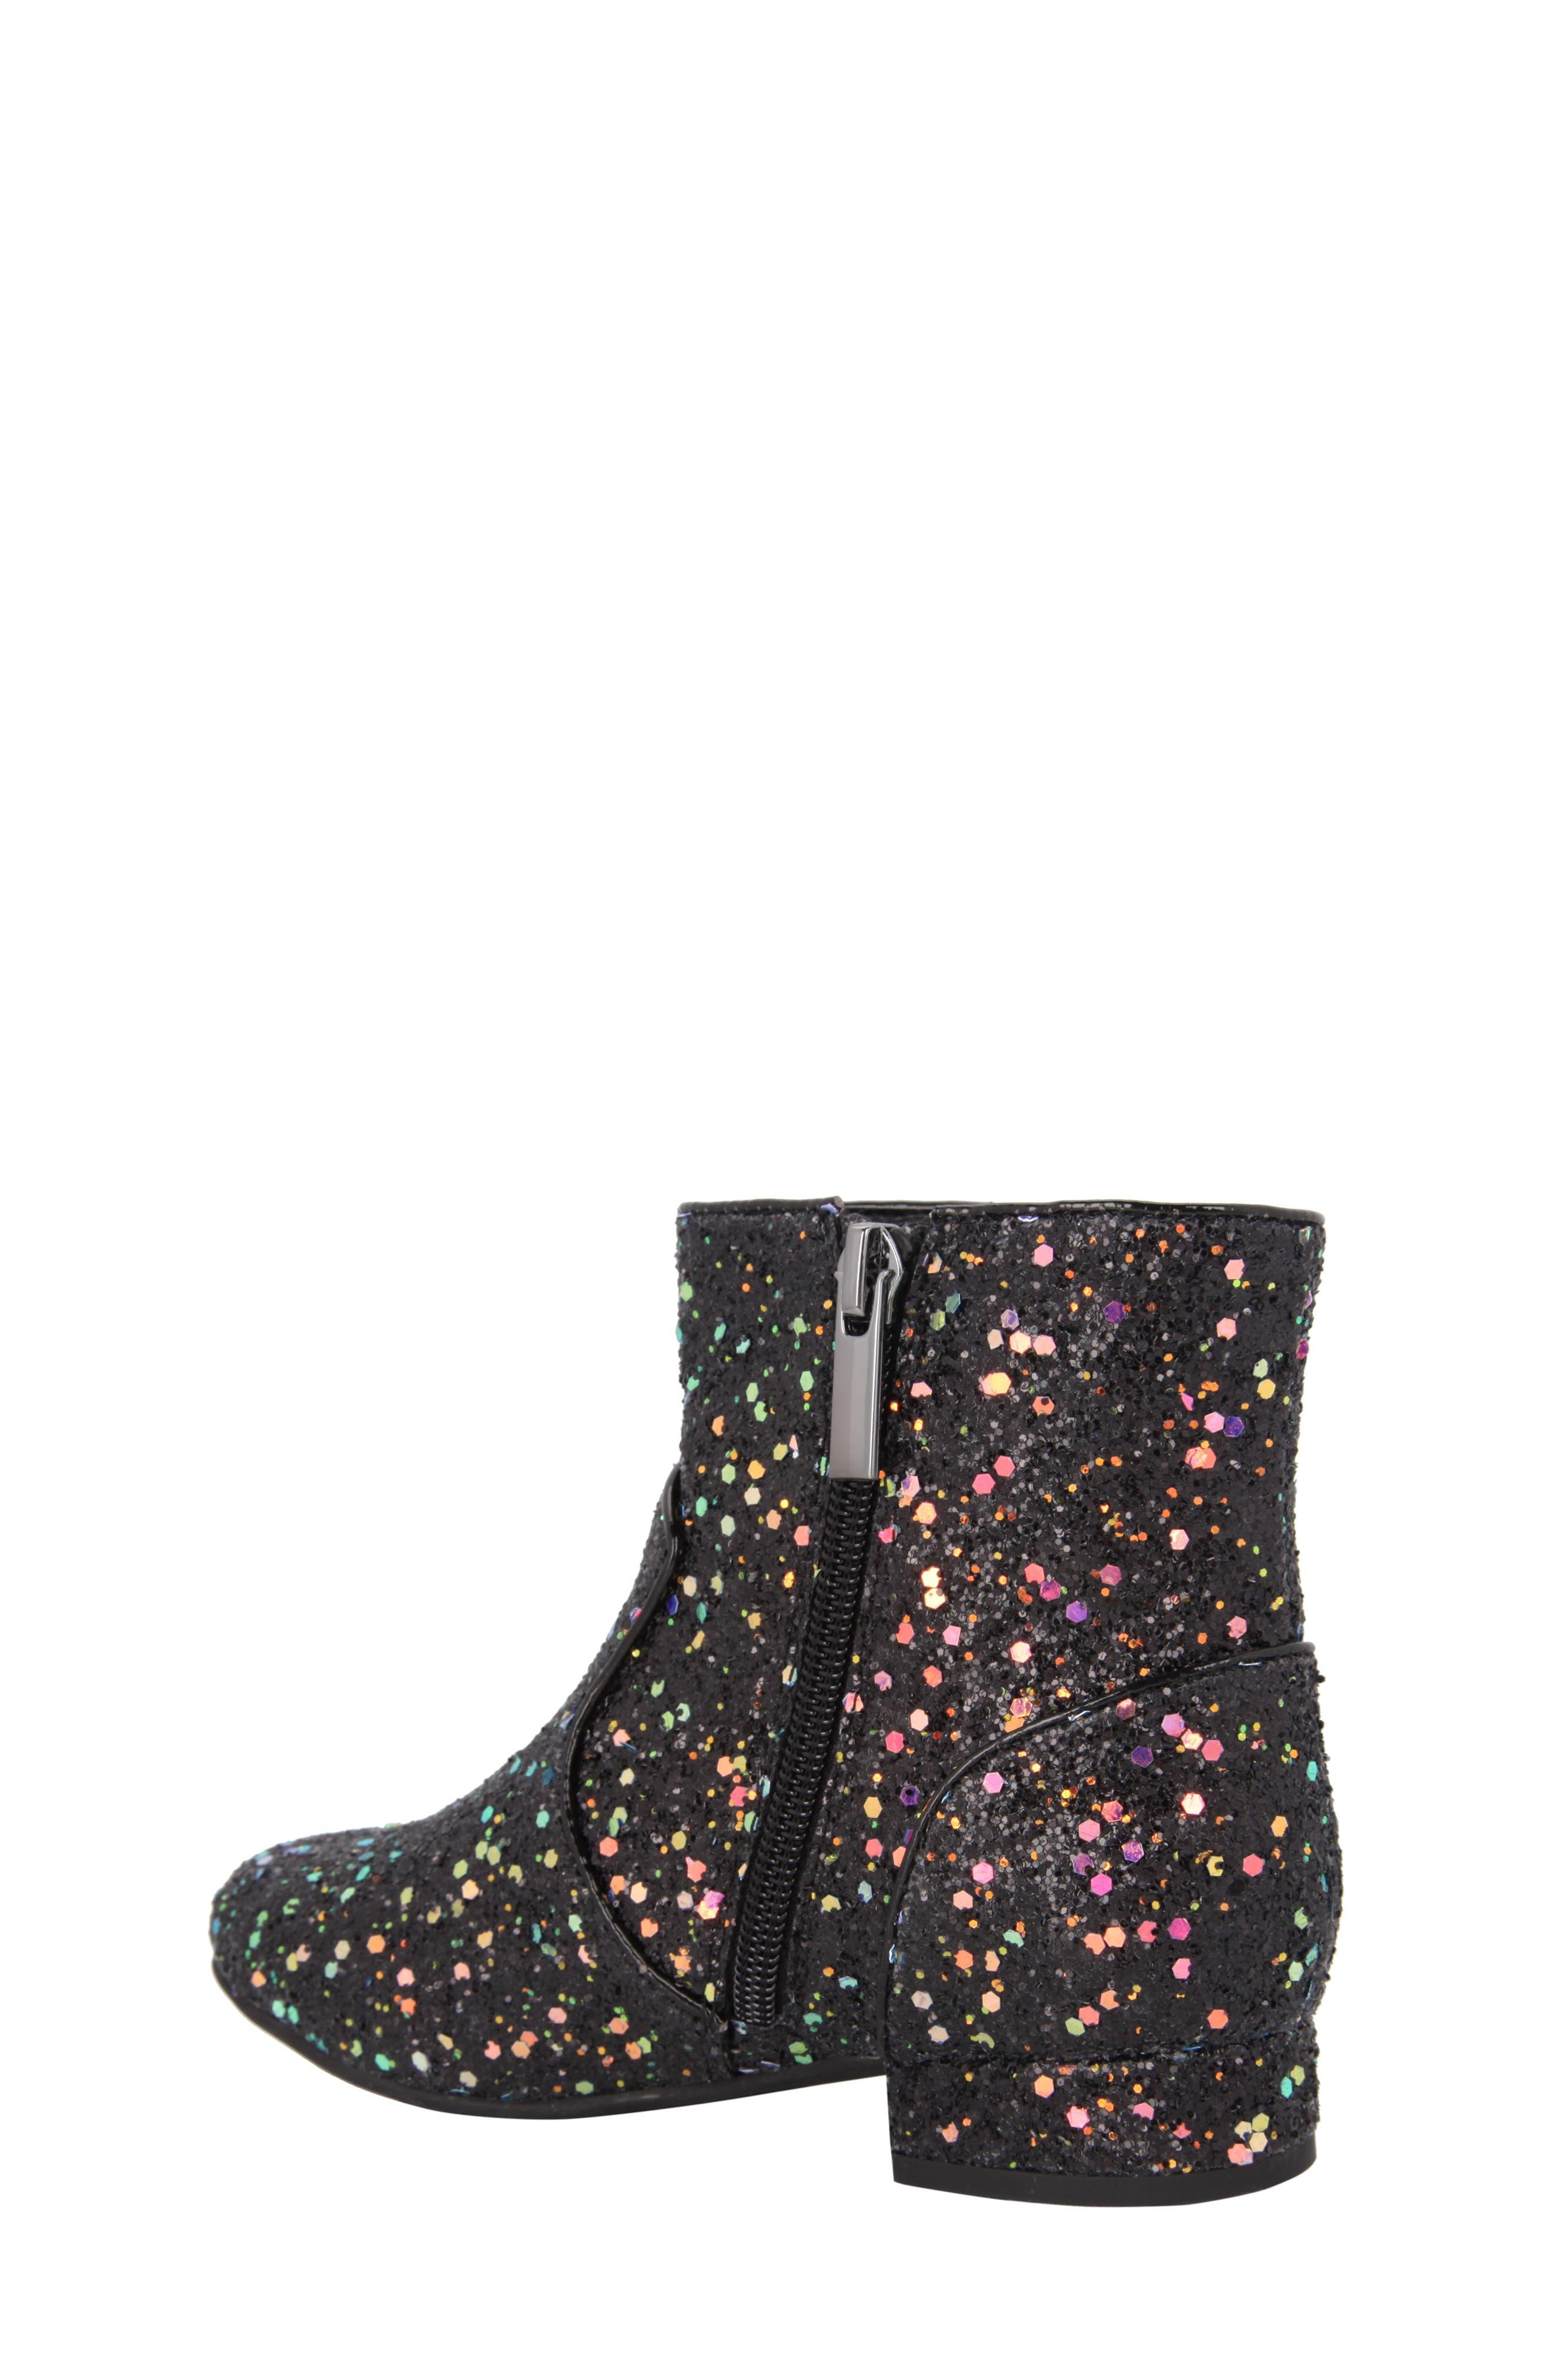 Amy Multicolor Glitter Bootie,                             Alternate thumbnail 2, color,                             Black Chunky Glitter